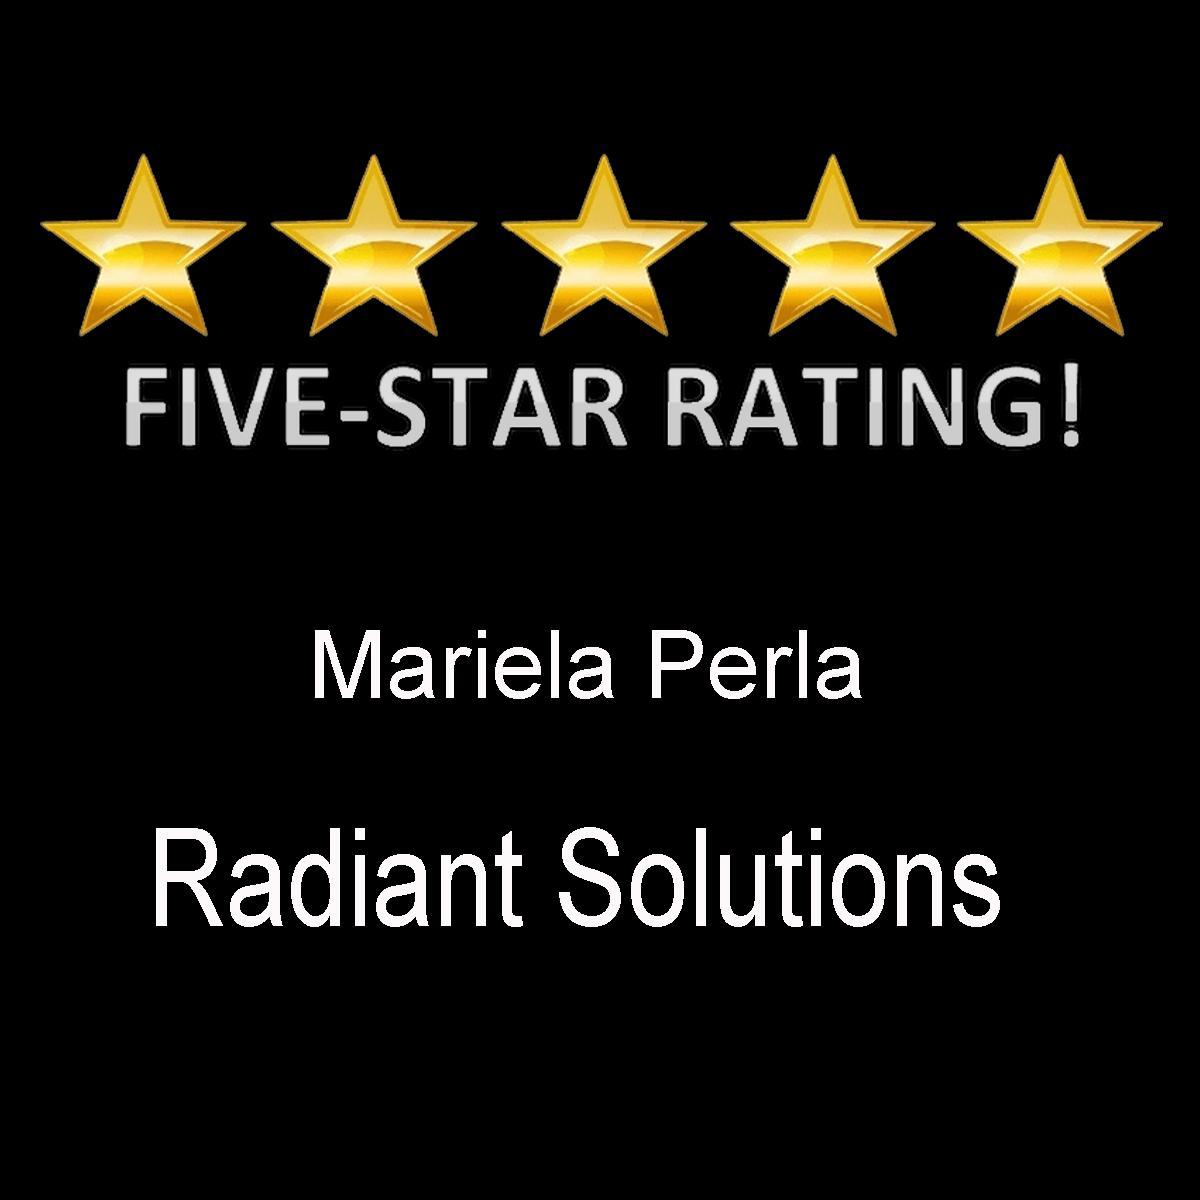 5 star radiant solutions